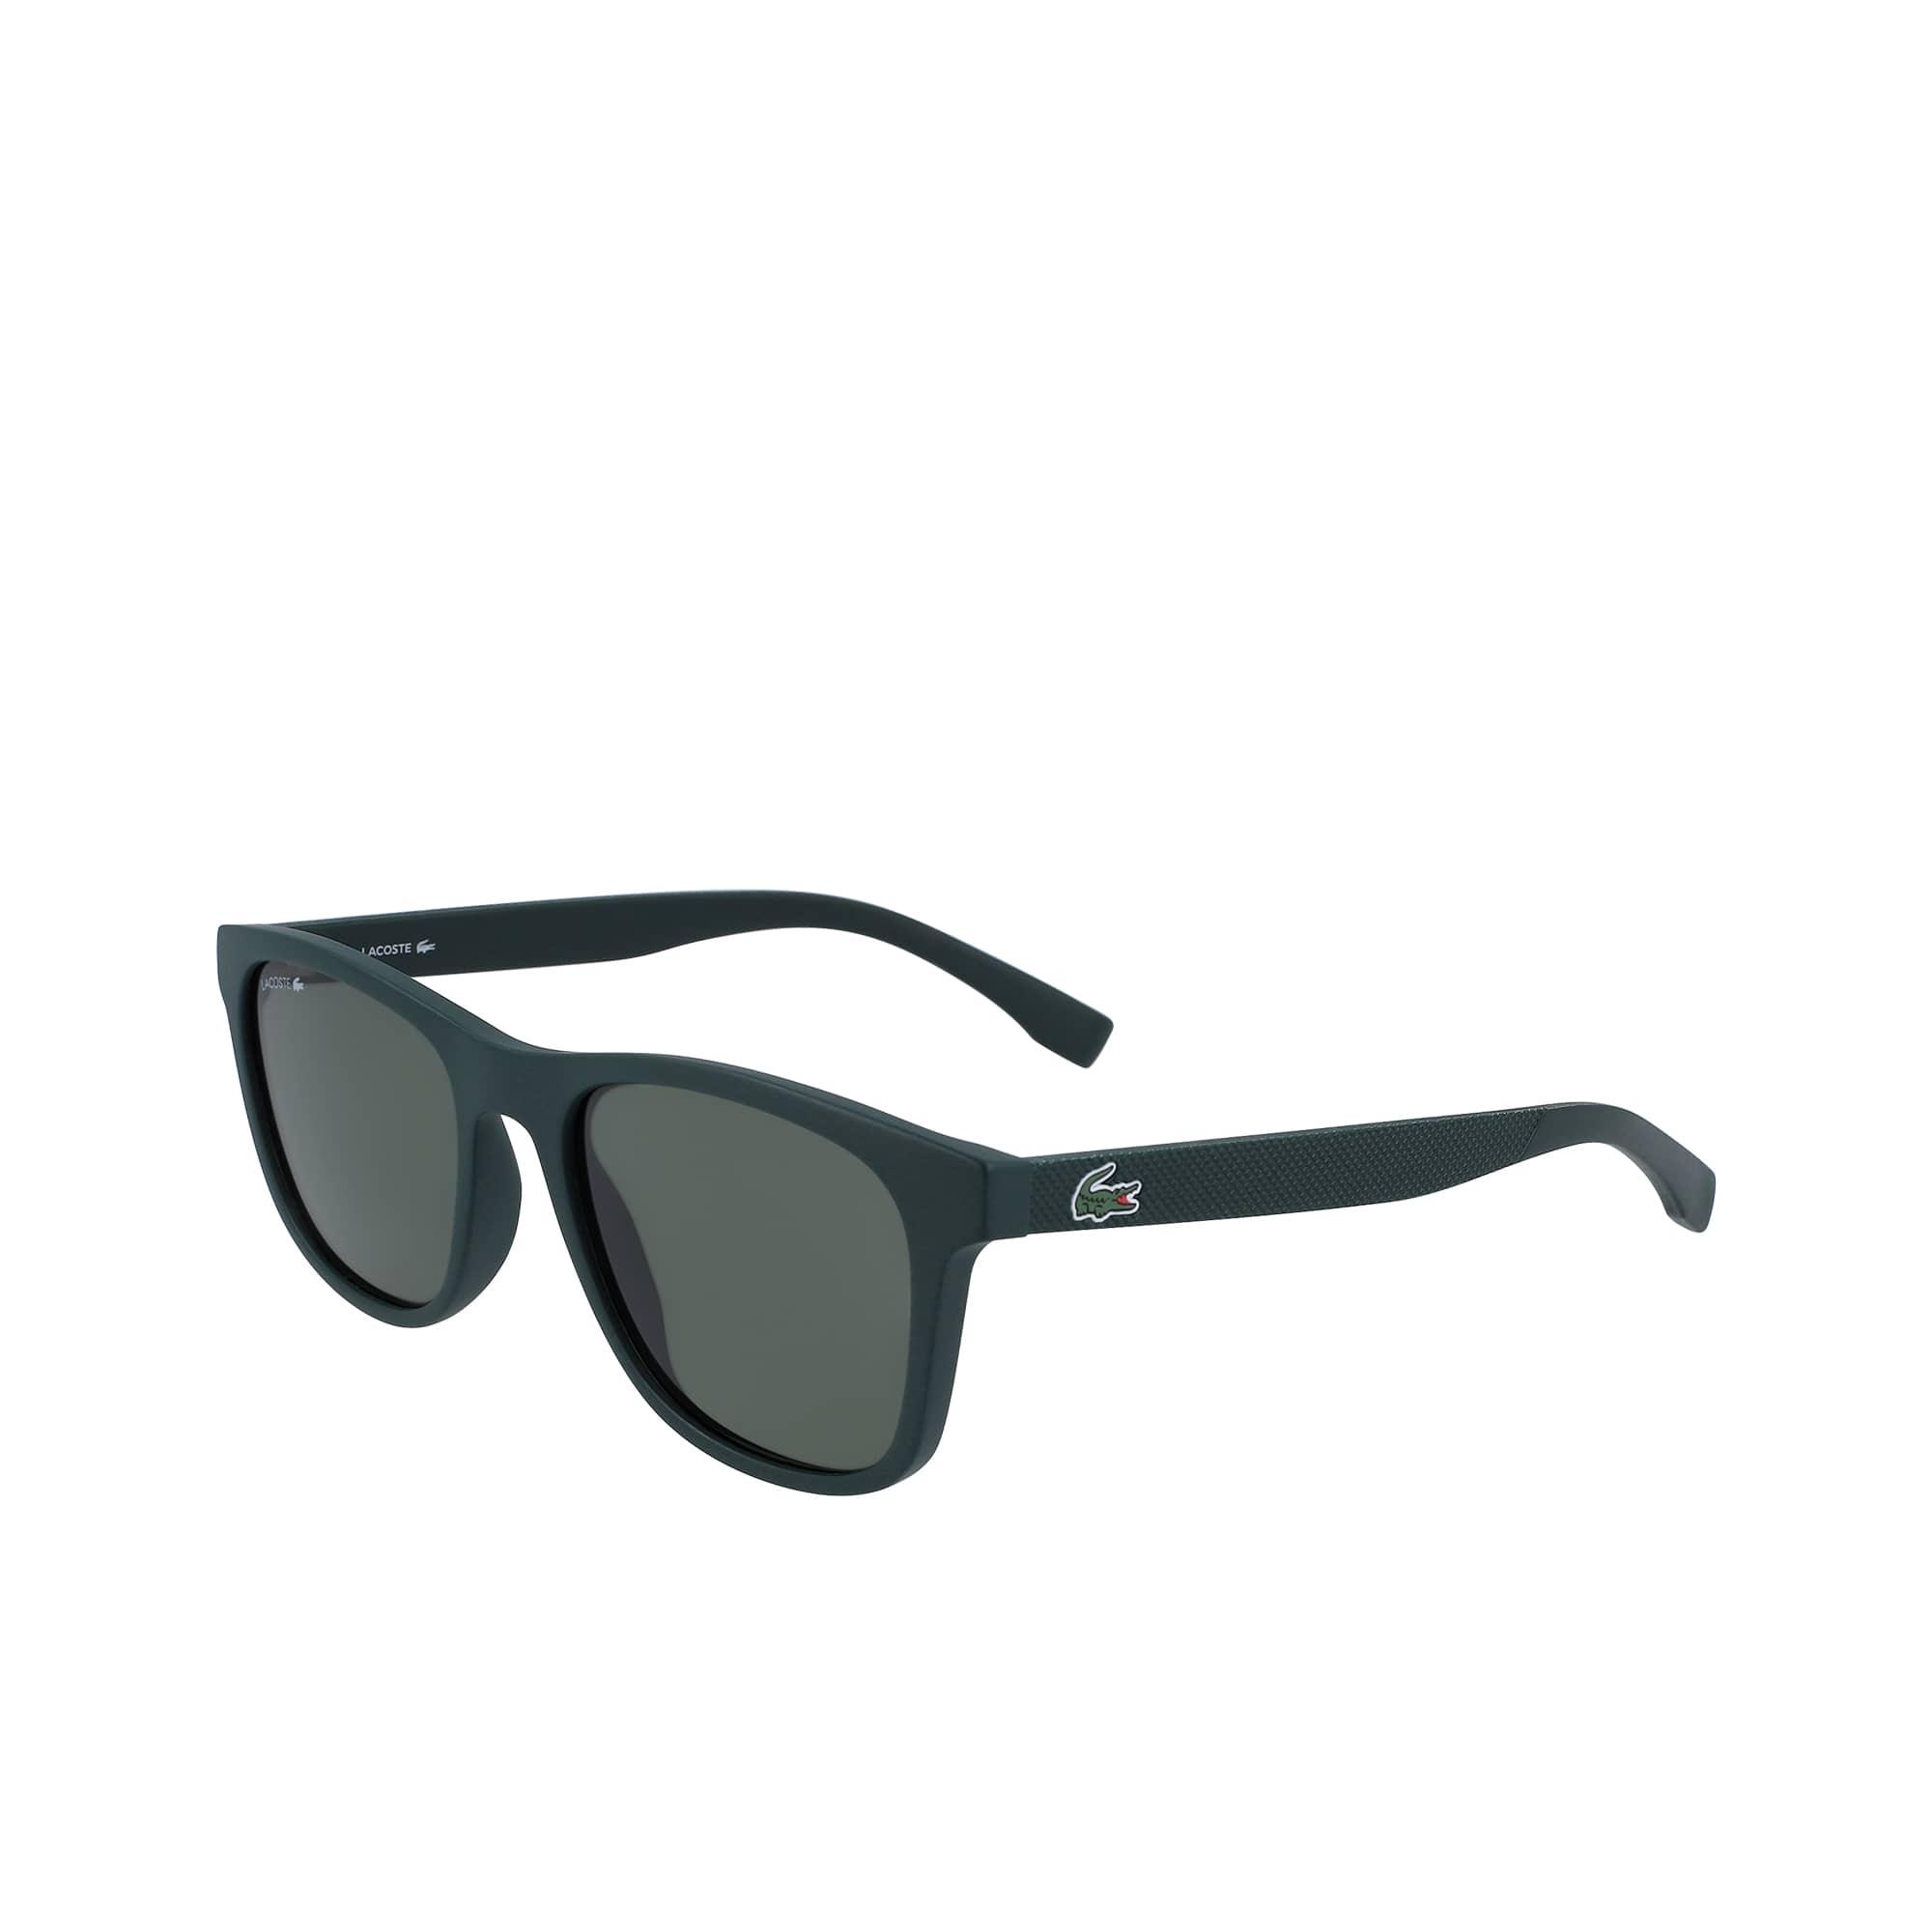 9afd7357c7 Rectangle Plastic L.12.12 Sunglasses